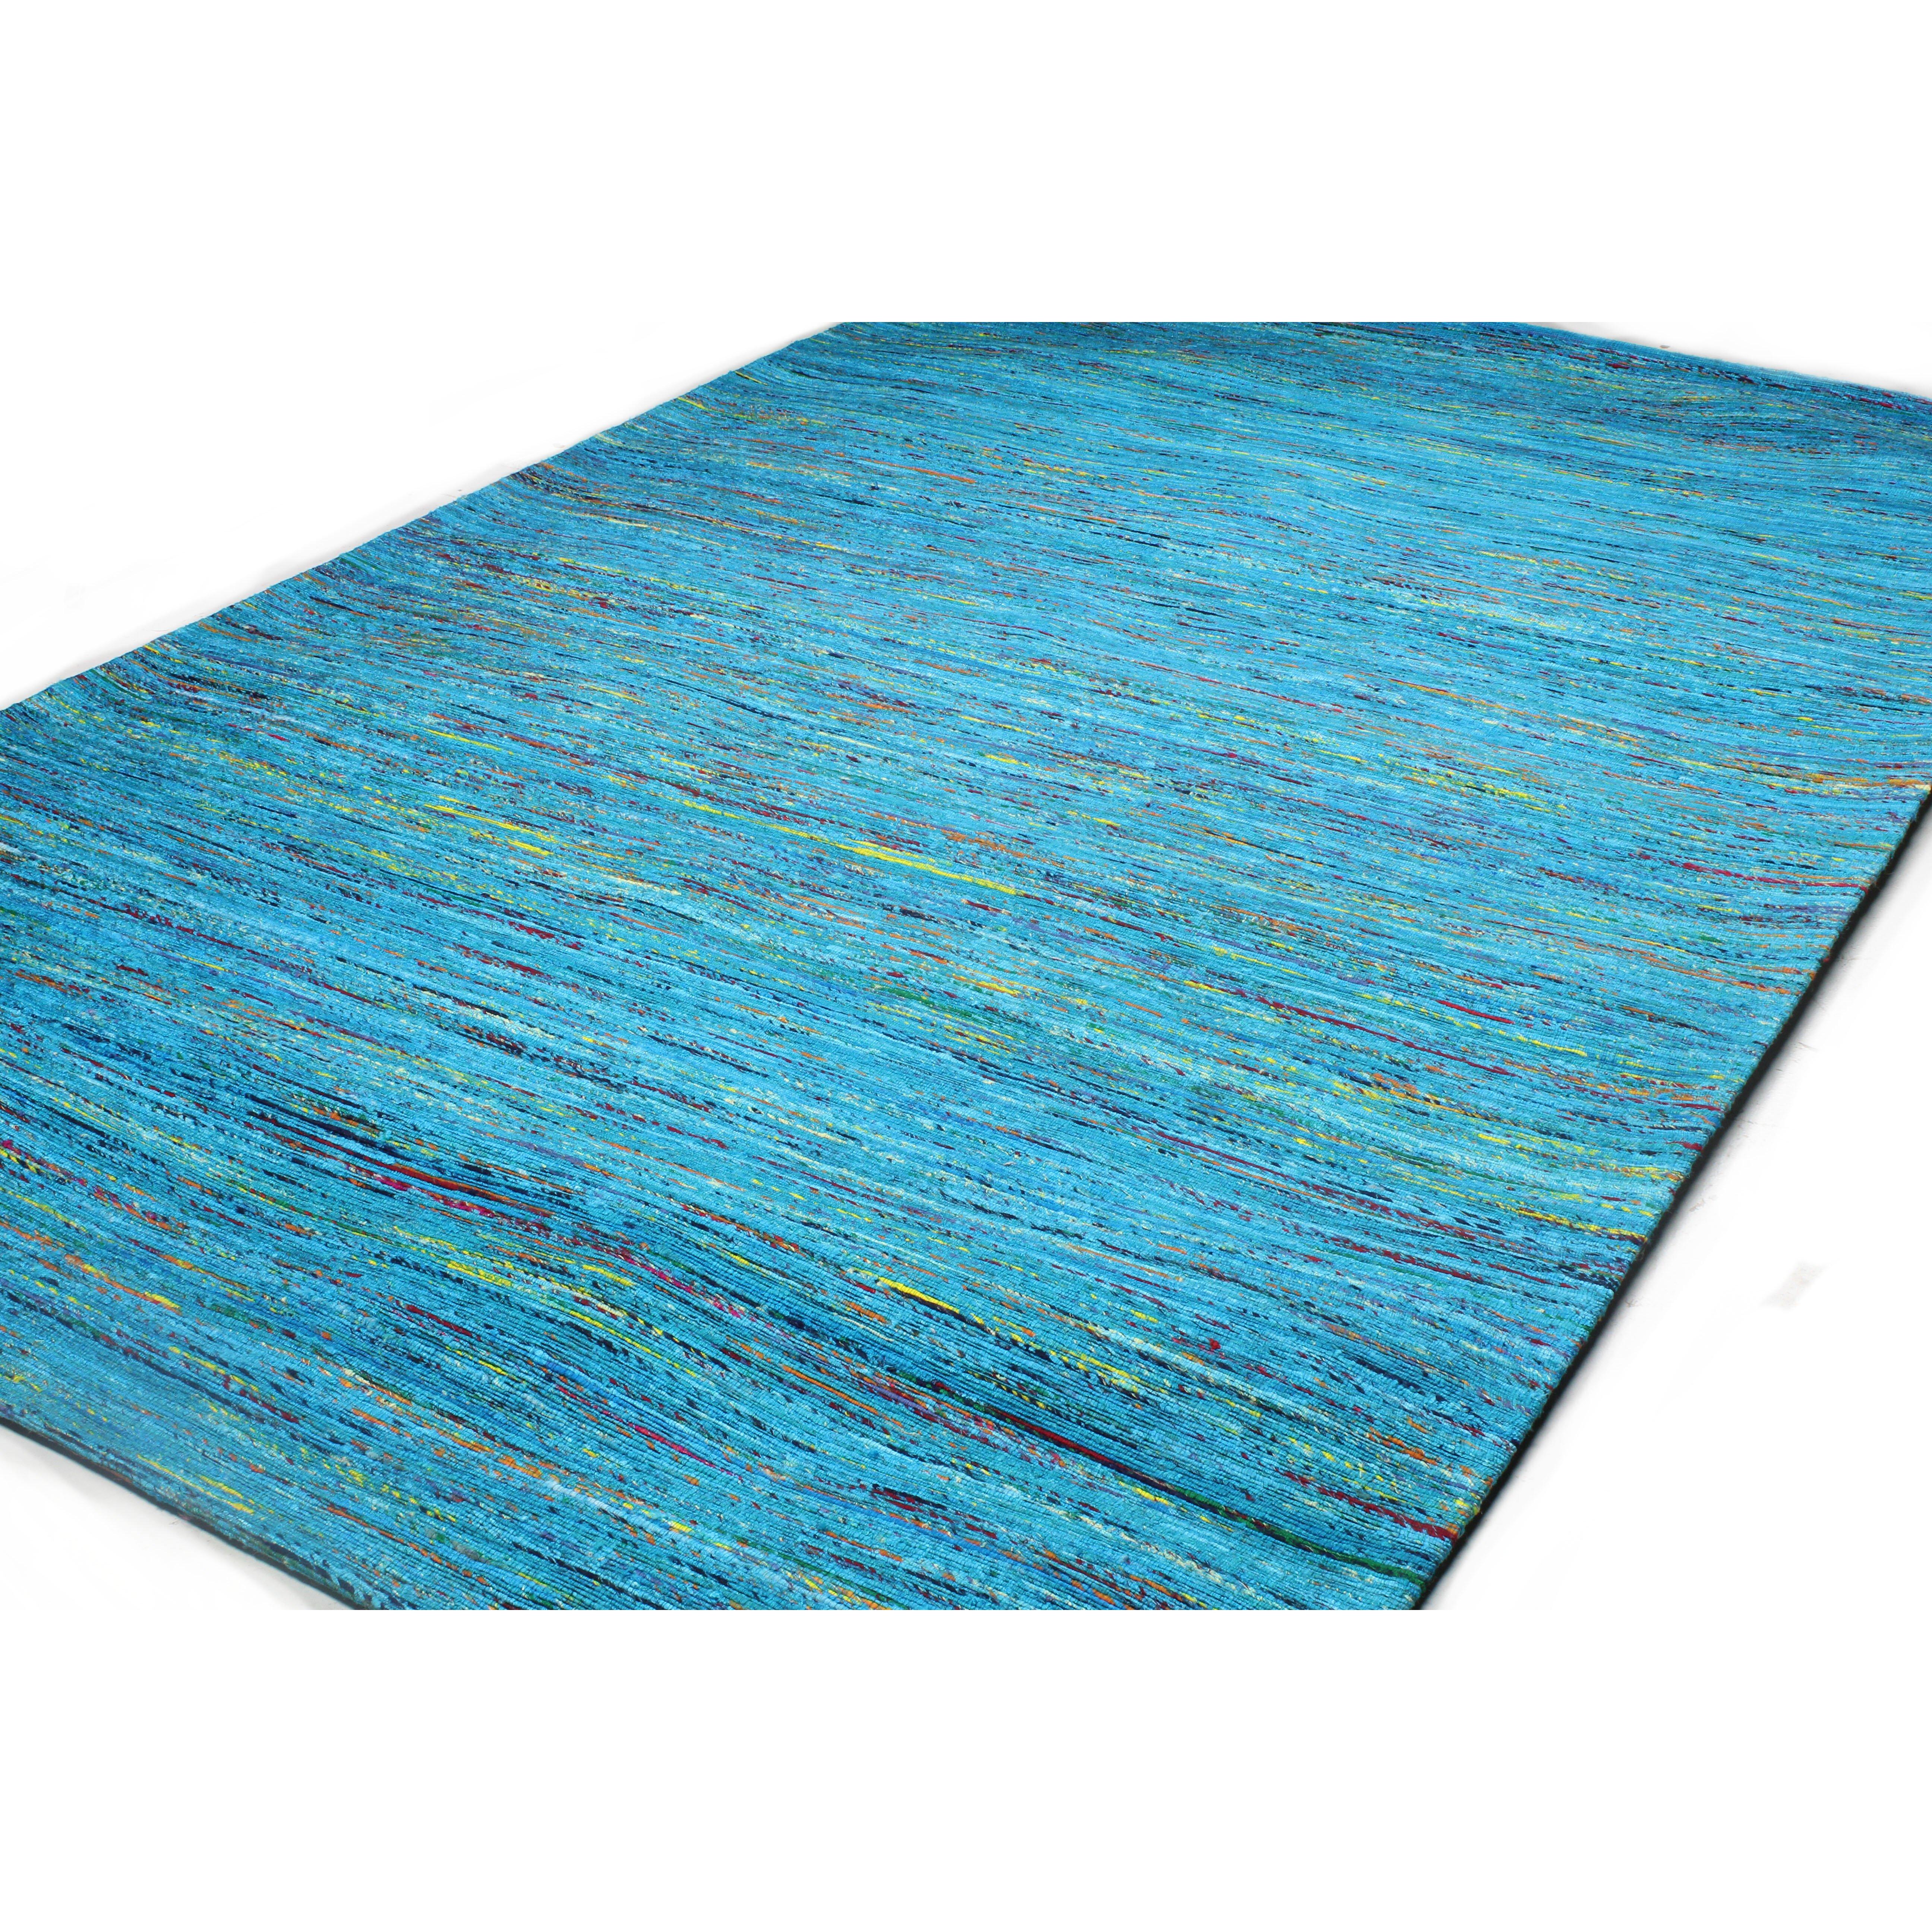 bashian rugs bohemian blue gold area rug reviews wayfair. Black Bedroom Furniture Sets. Home Design Ideas